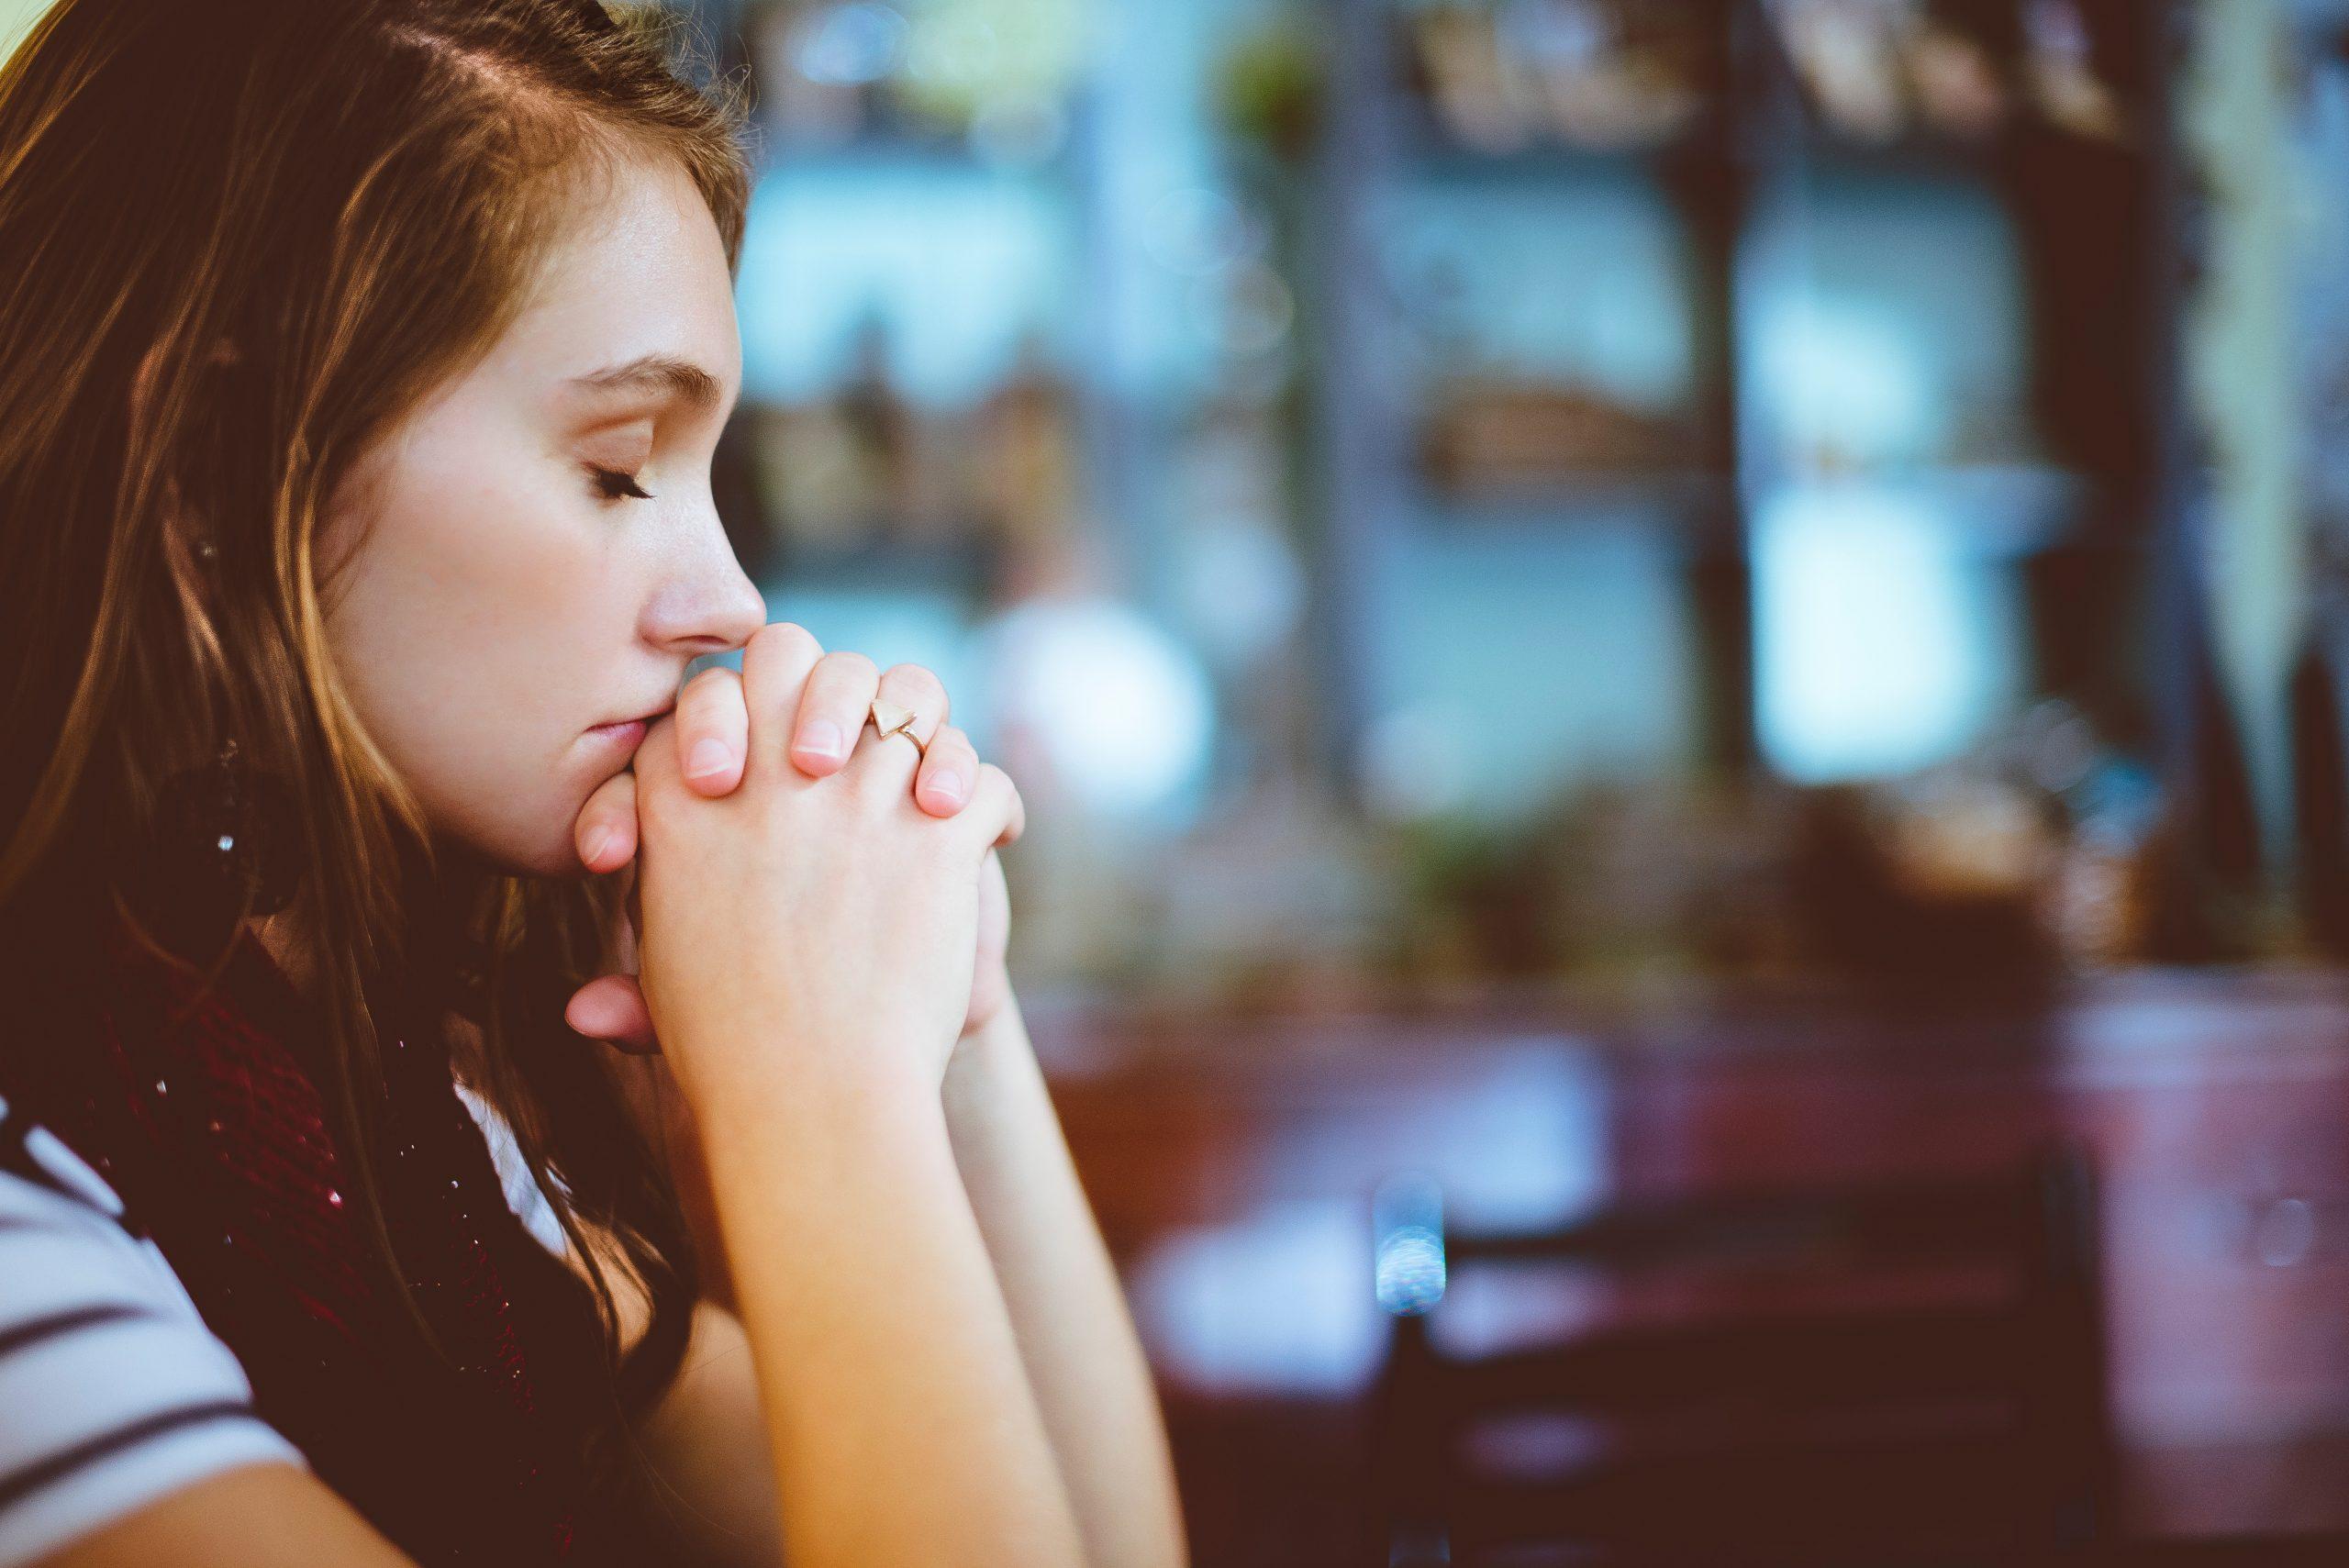 The Power of Unanswered Prayers